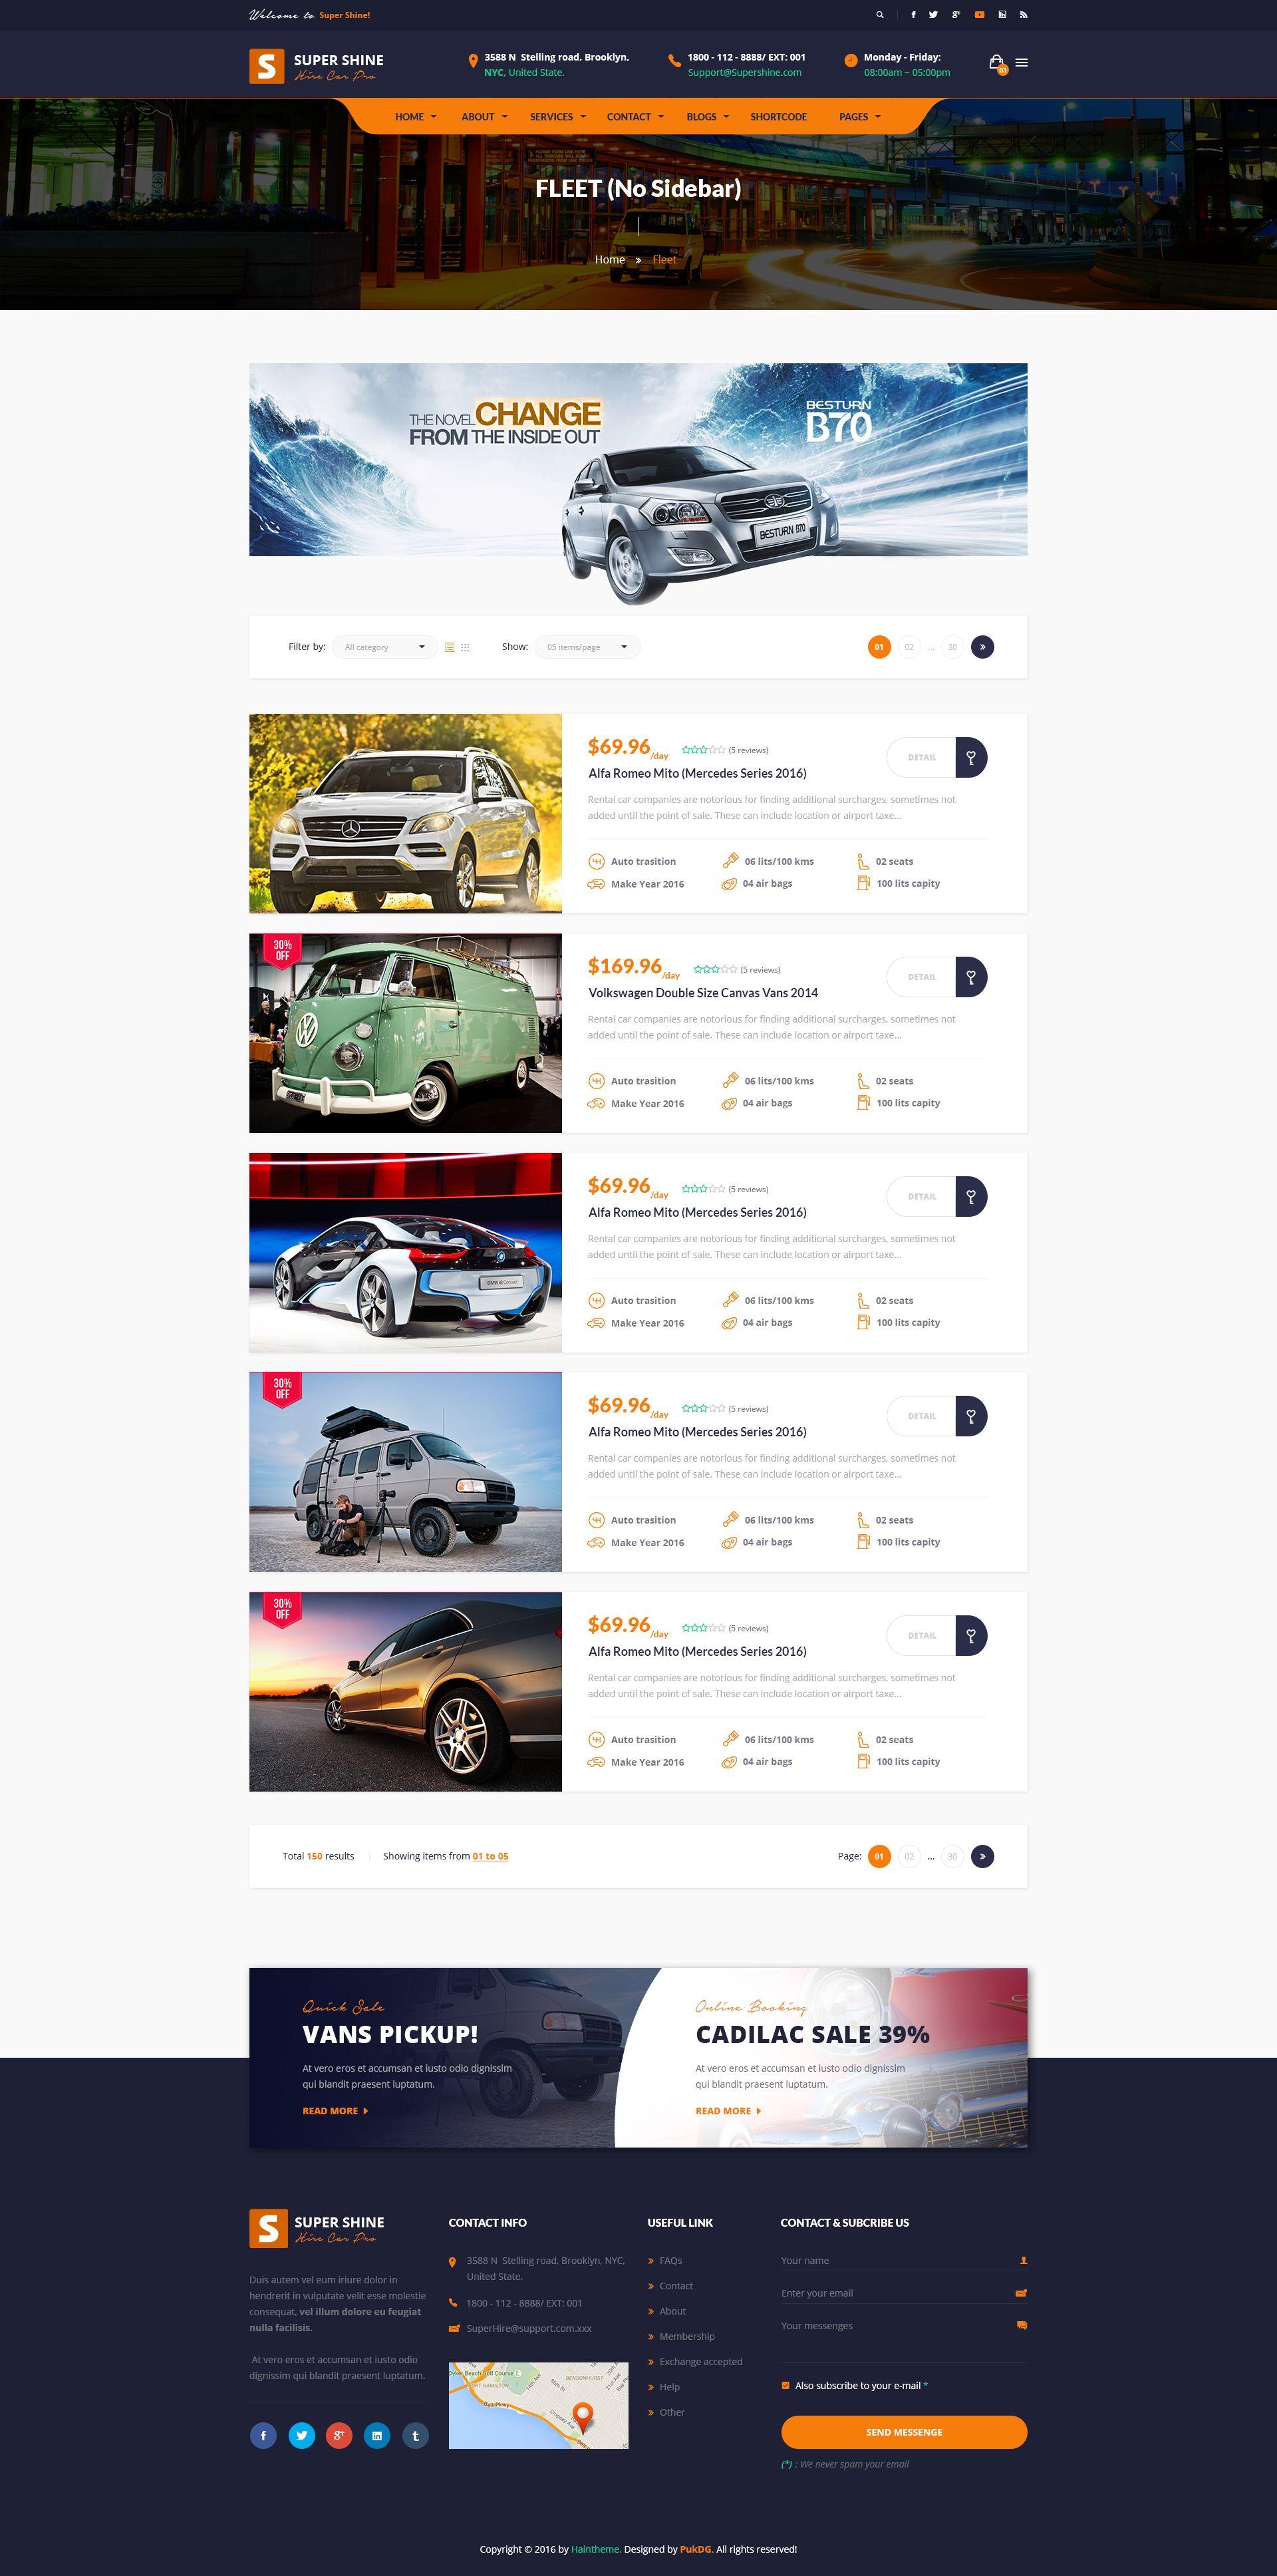 Super Shine Car Hire Psd Template Booking System Car Booking Car Hire Car Rental Car Rental Psd Psd Psd Templ Car Hire Psd Templates Templates